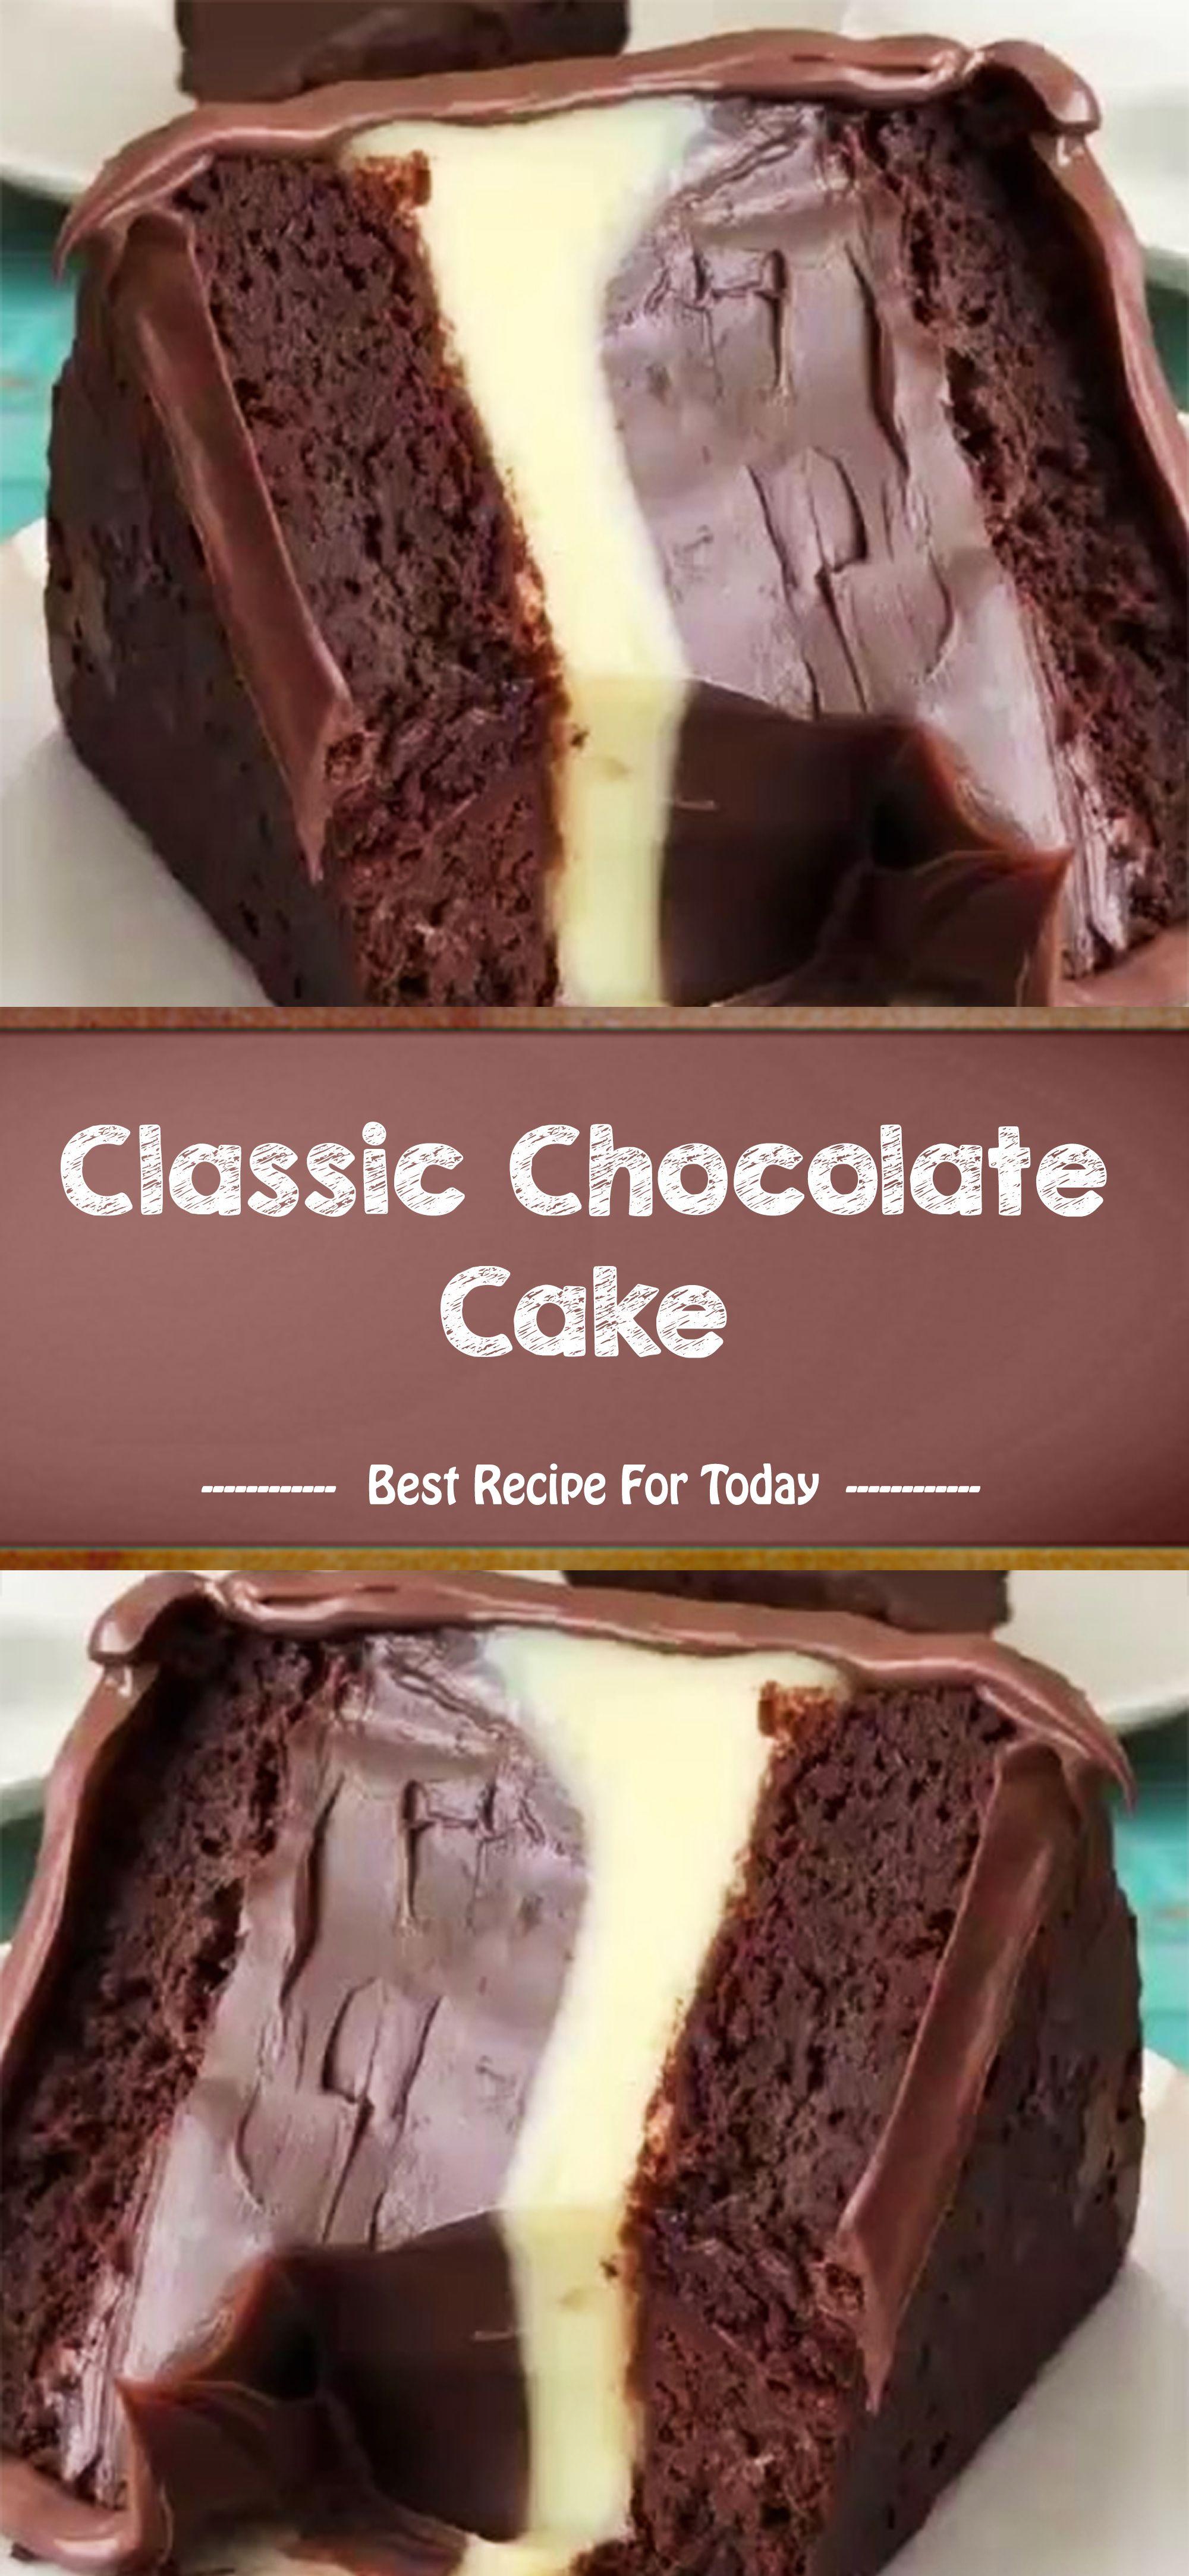 Classic Chocolate Cake #oreofrosting